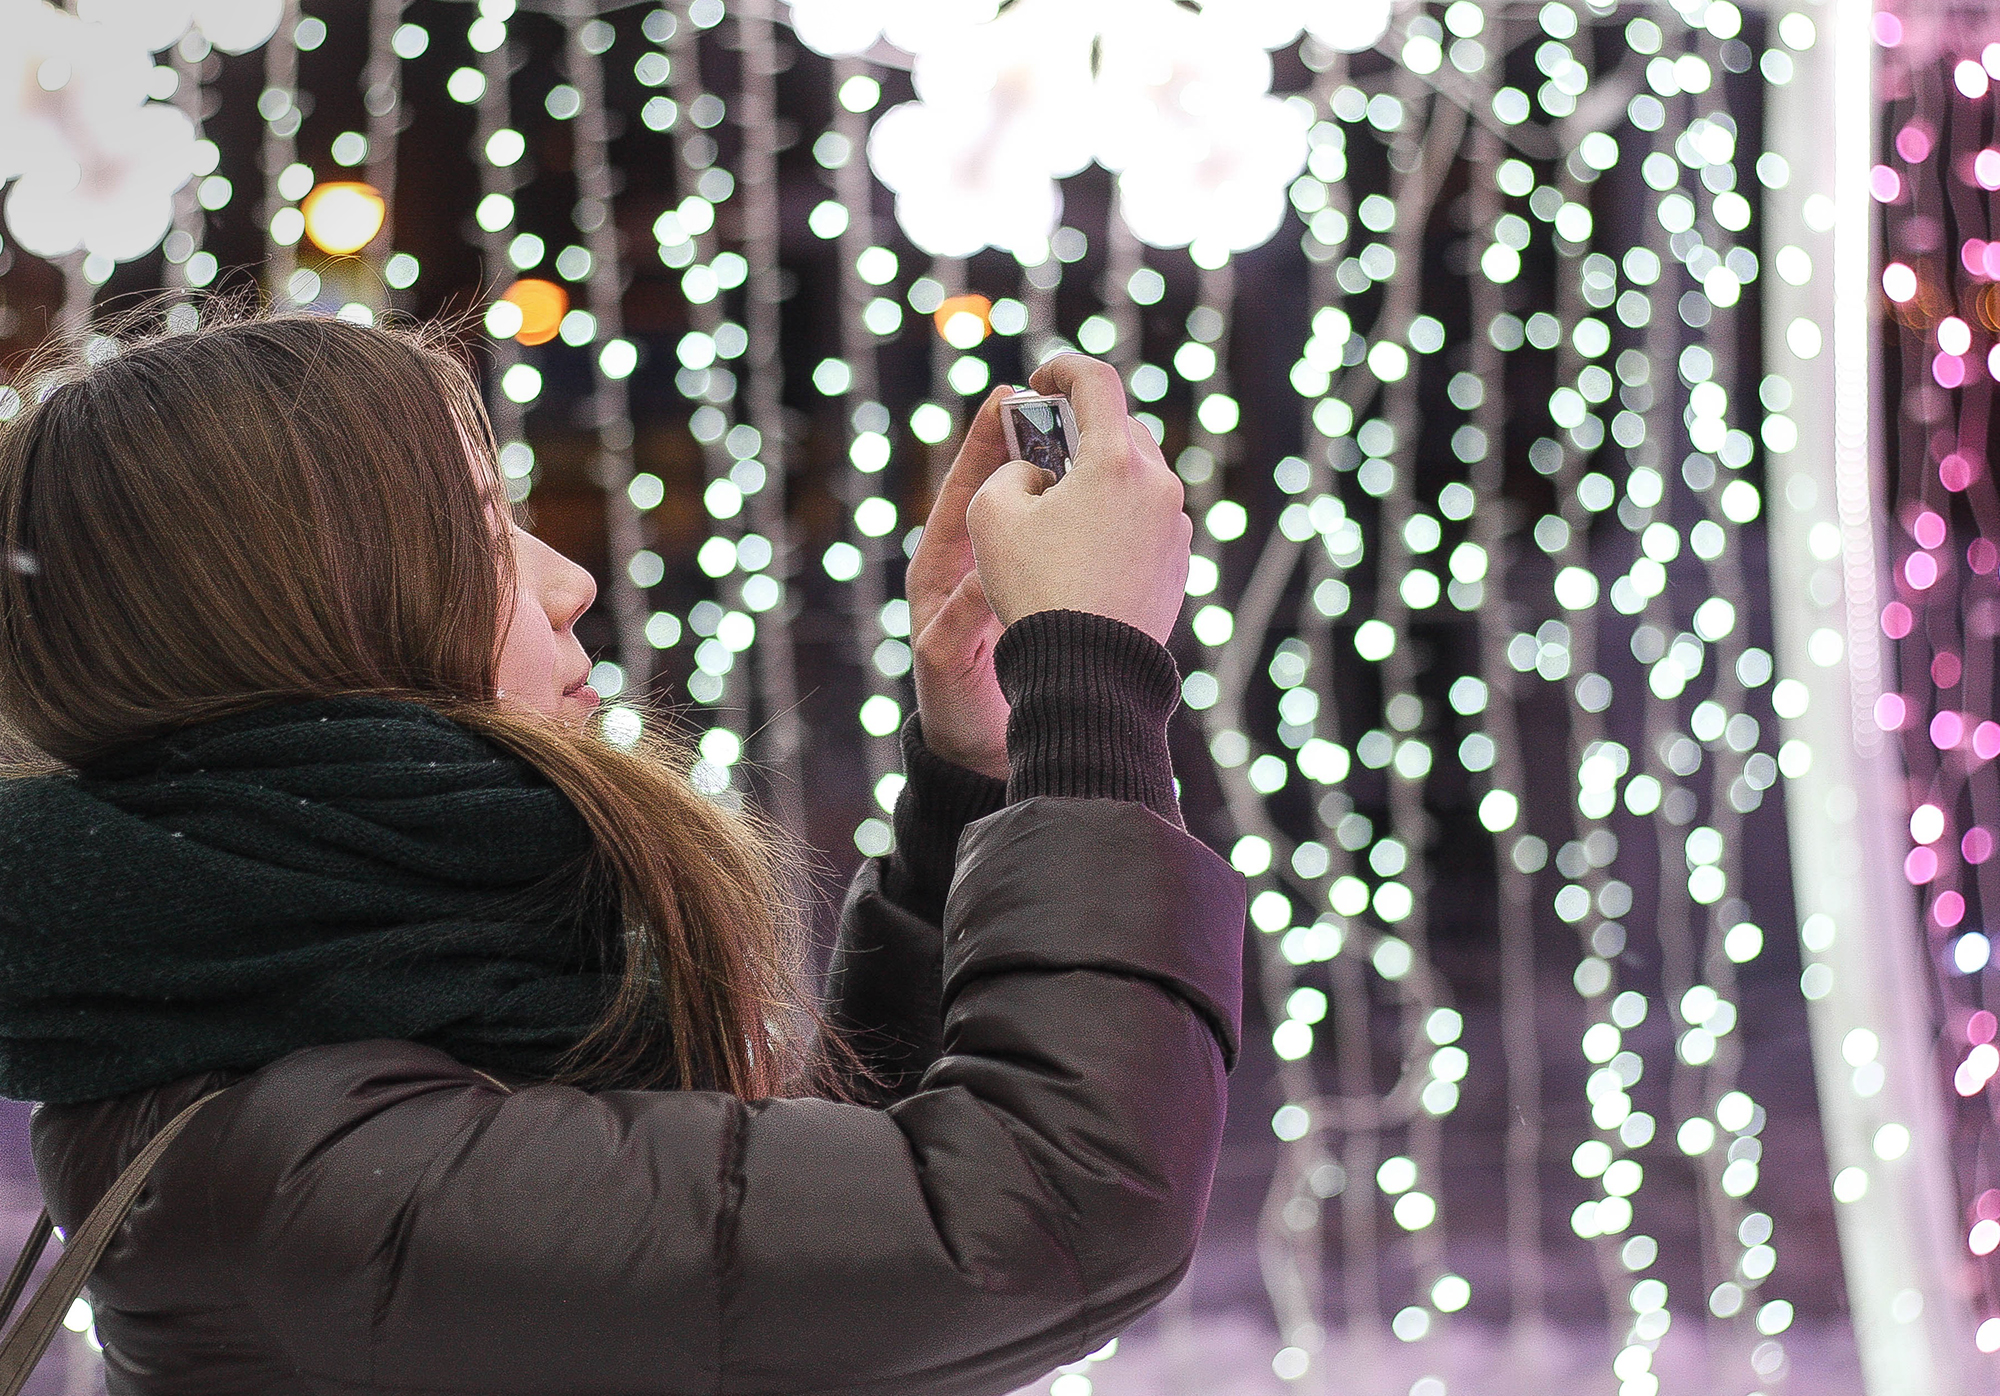 8 Fun Social Media Ideas For Your Church At Christmas